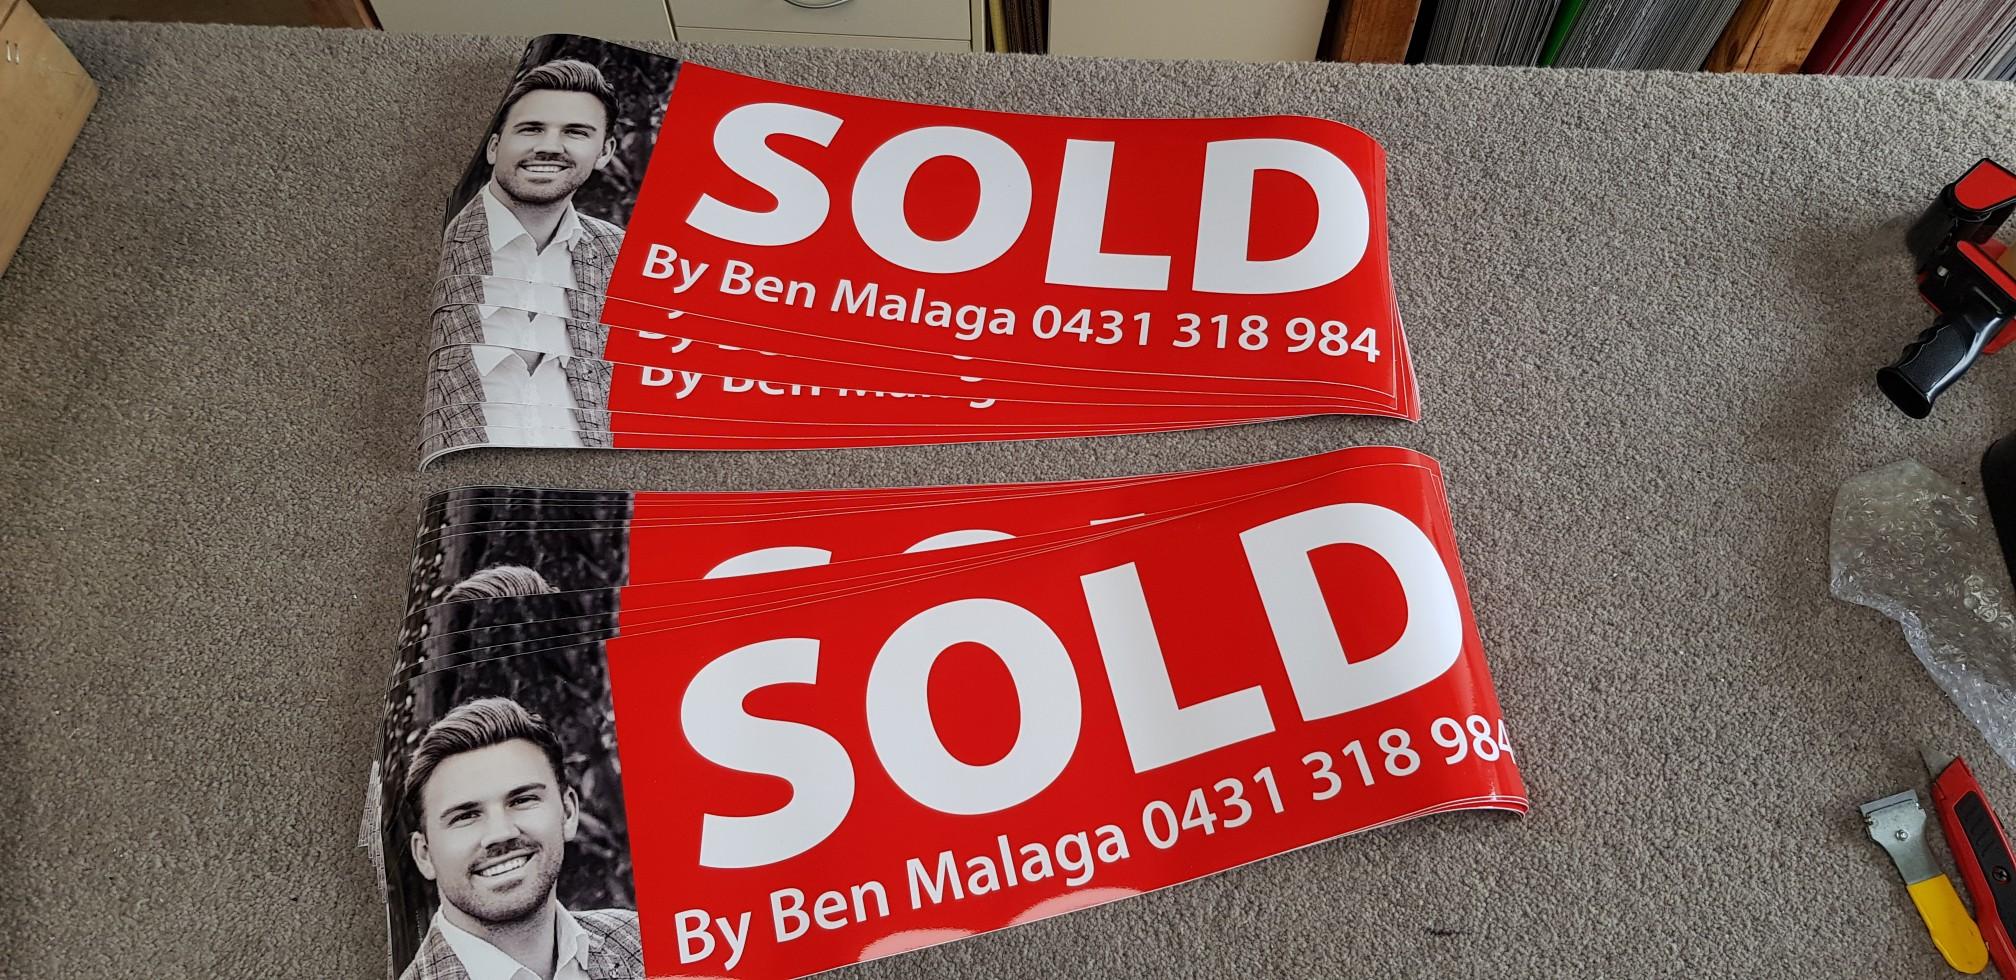 malaga-real-estate-730x240mm-sold-sticker.jpg